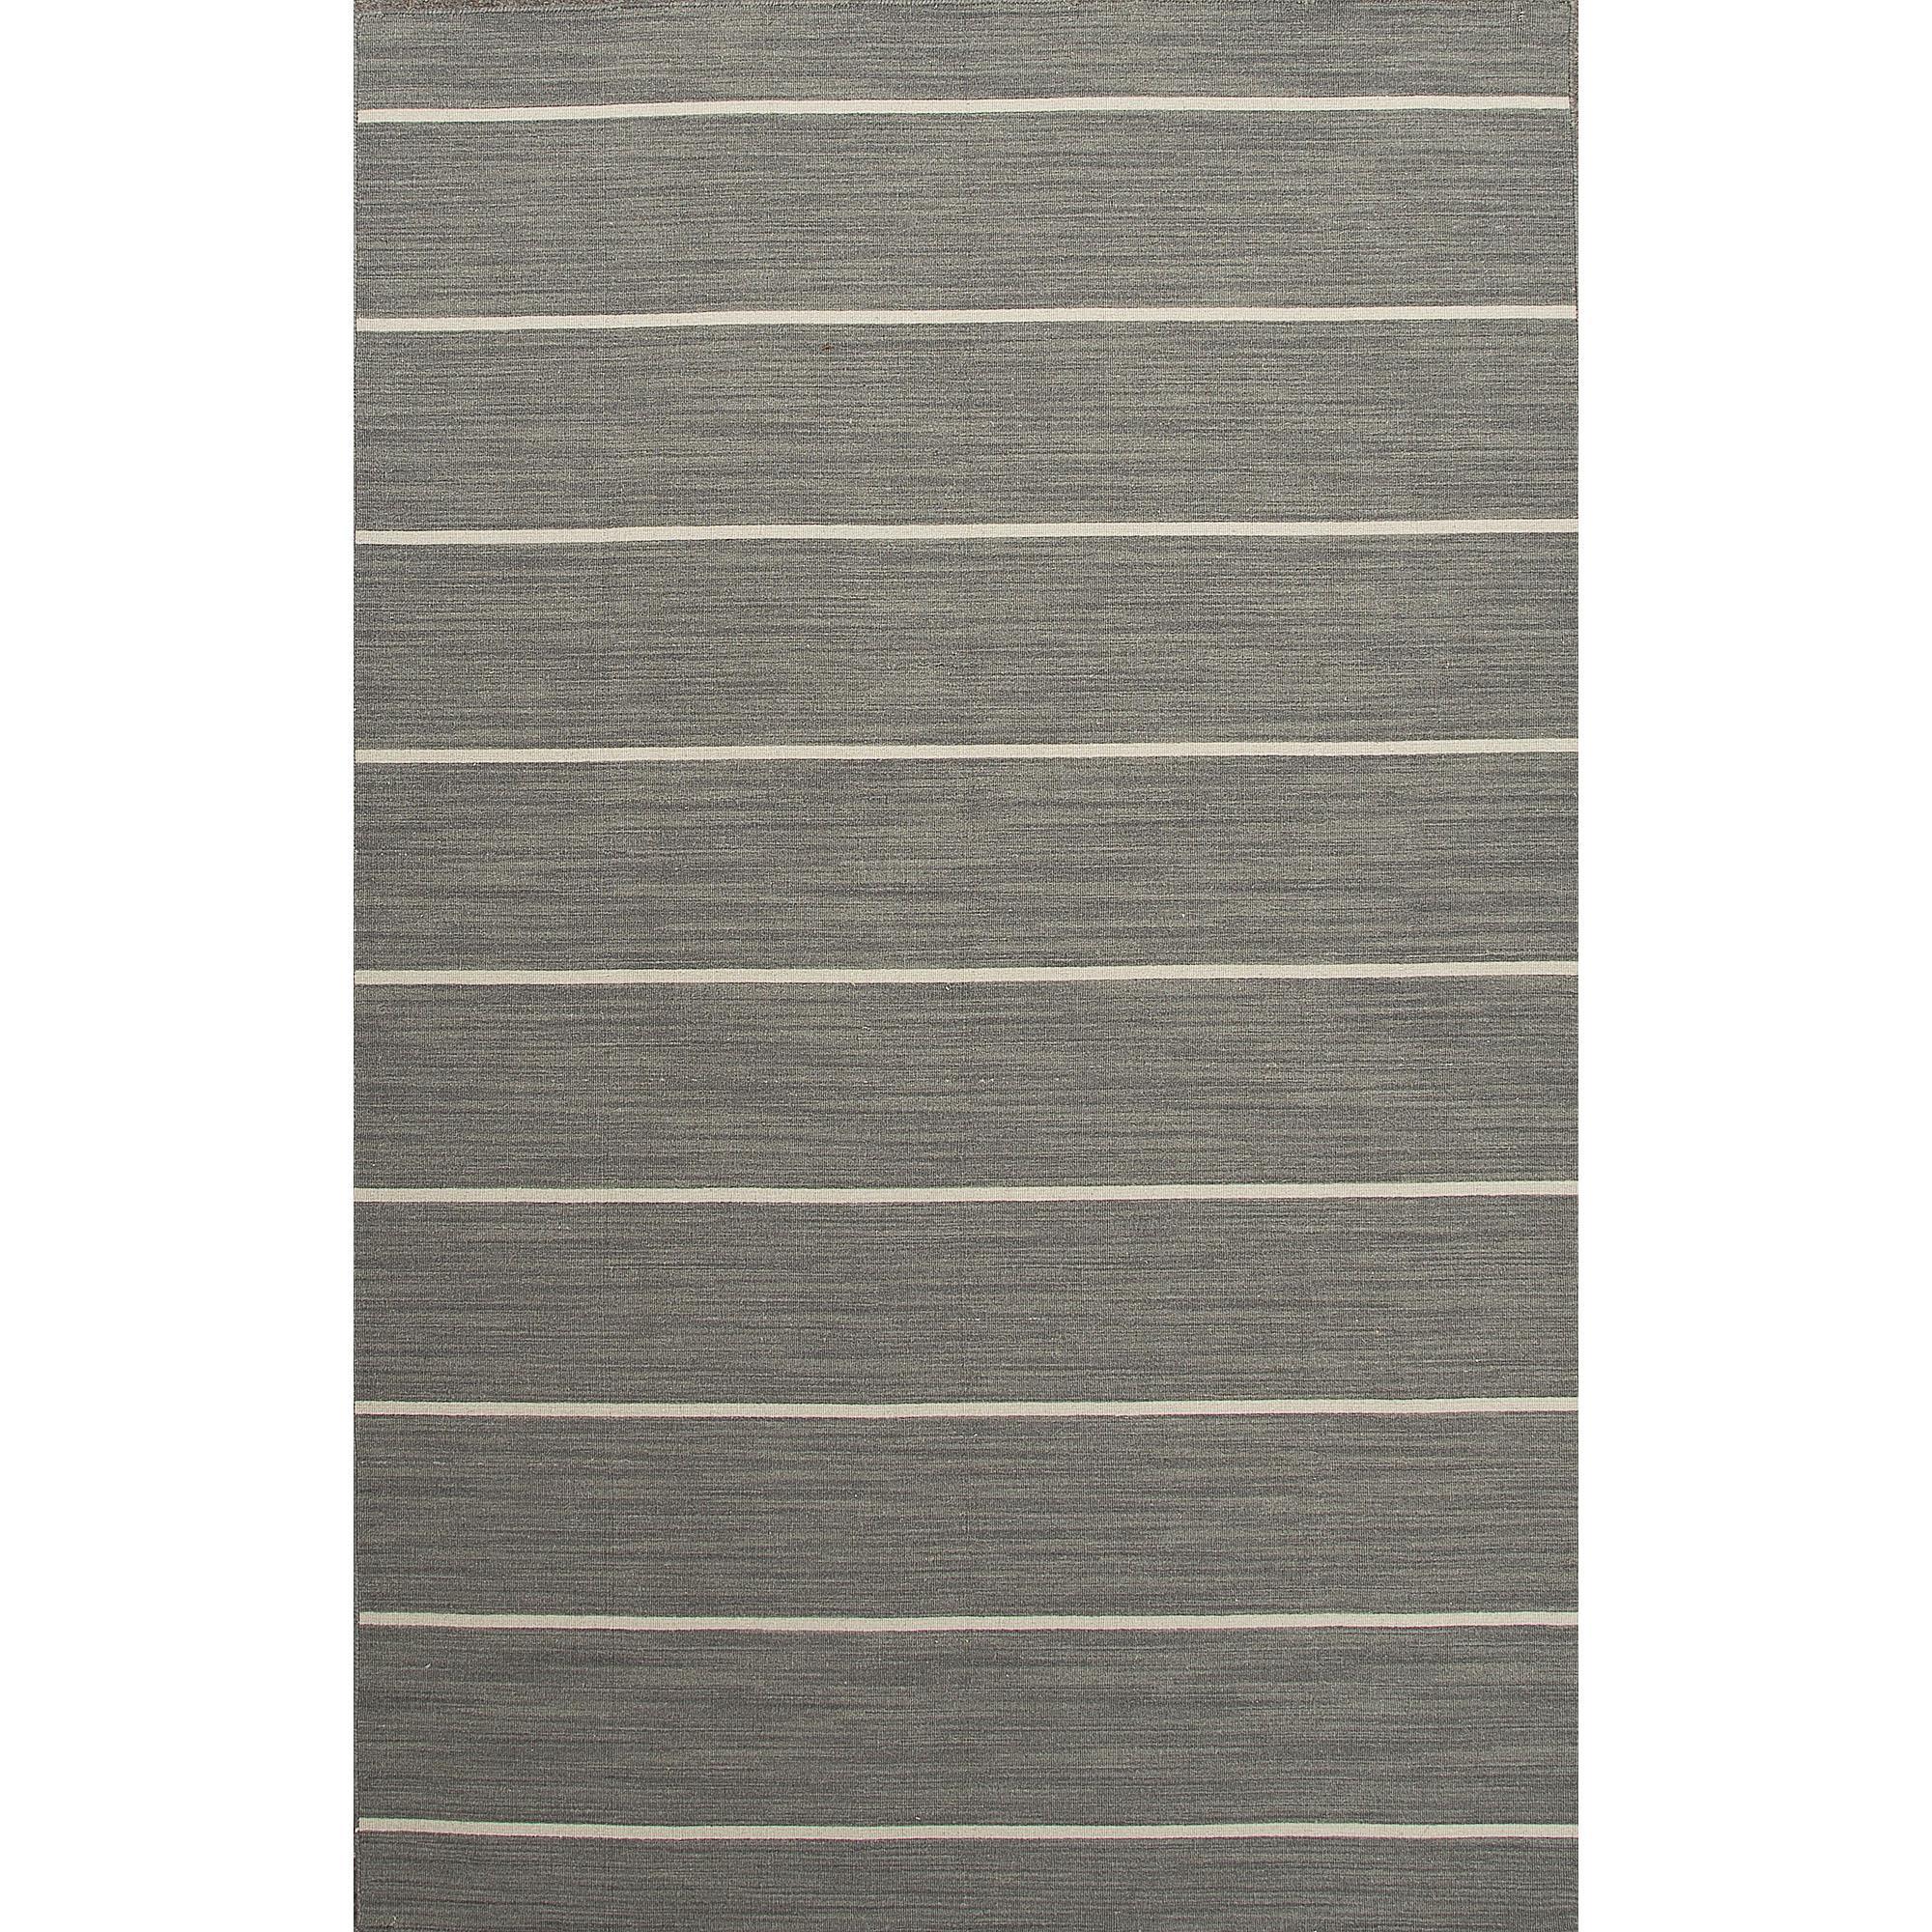 JAIPUR Rugs Coastal Shores 8 x 10 Rug - Item Number: RUG122709